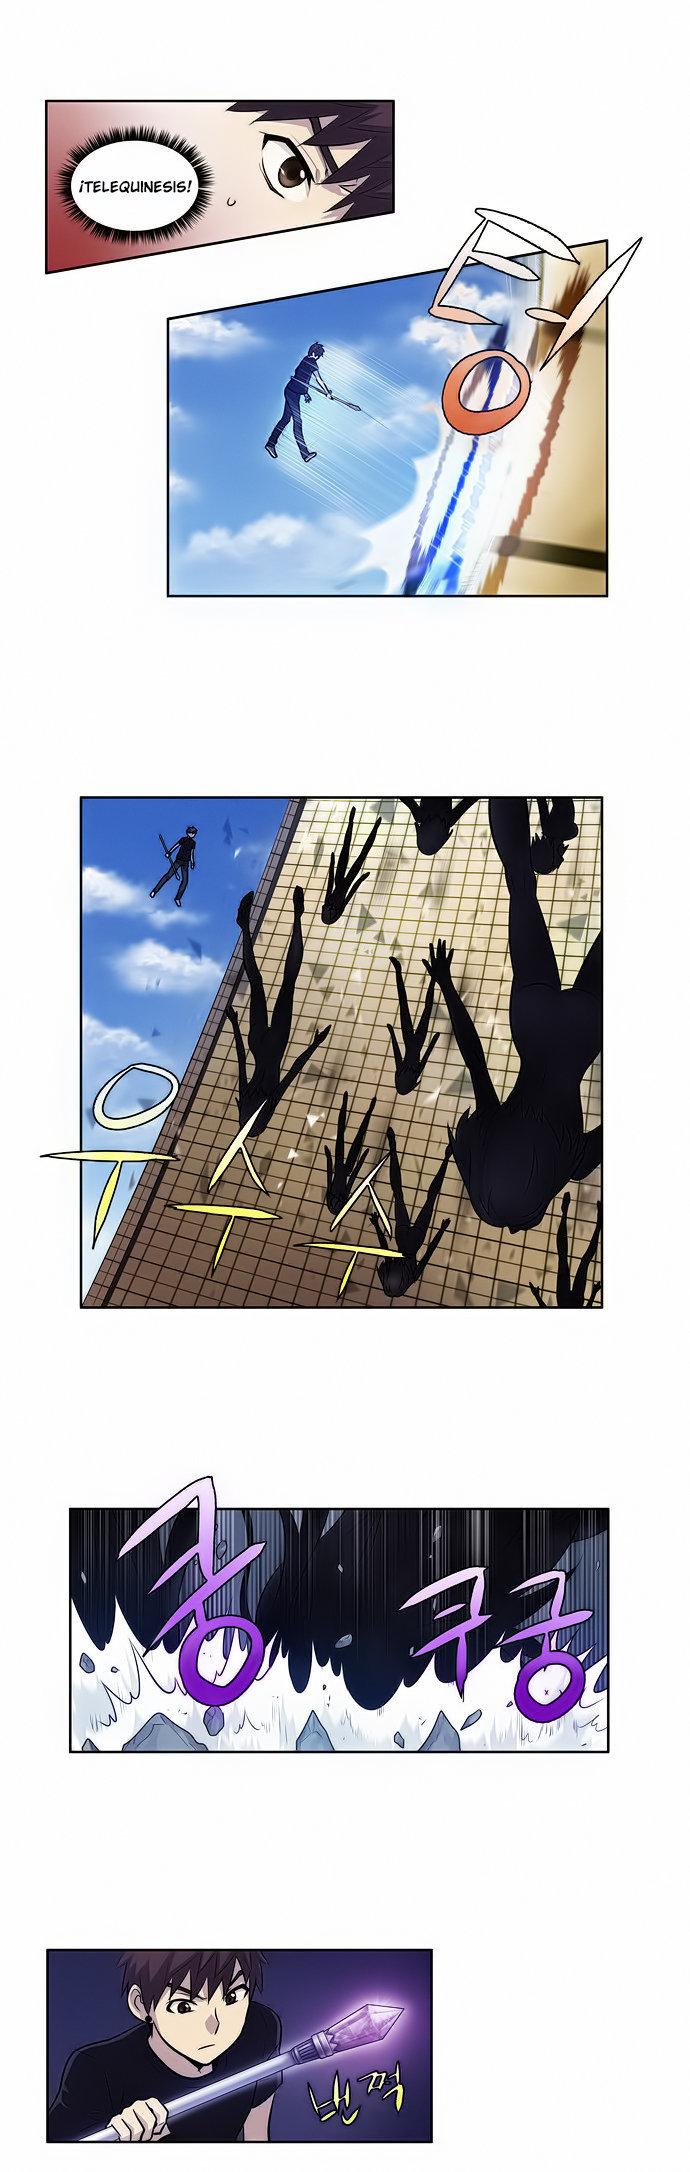 https://c5.ninemanga.com/es_manga/61/1725/439978/2a78c2152f92e8bb092f2d00053bf078.jpg Page 6